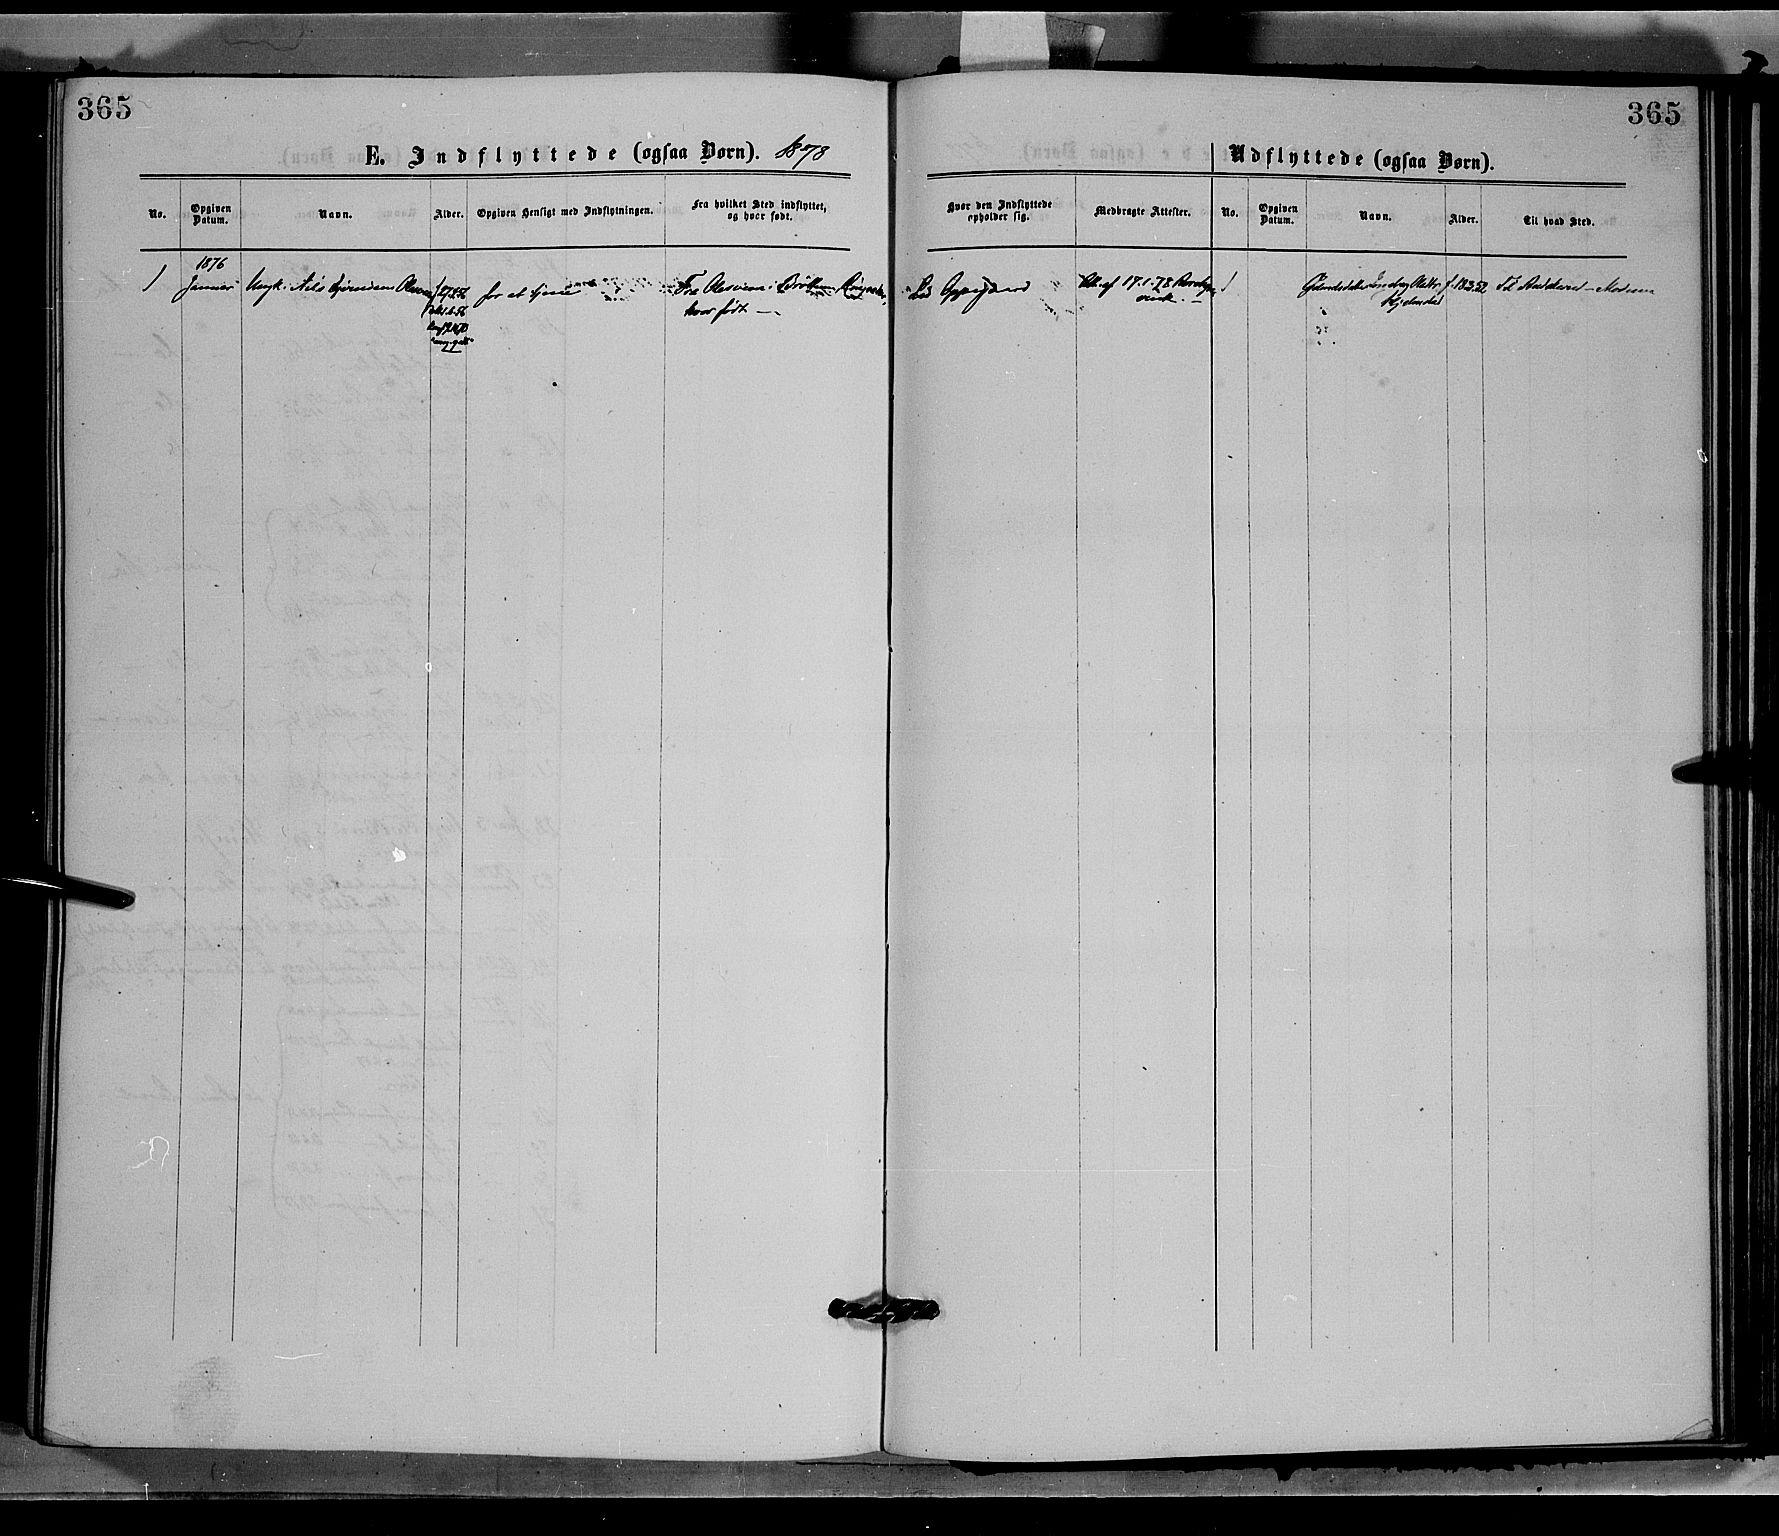 SAH, Øyer prestekontor, Ministerialbok nr. 7, 1875-1878, s. 365